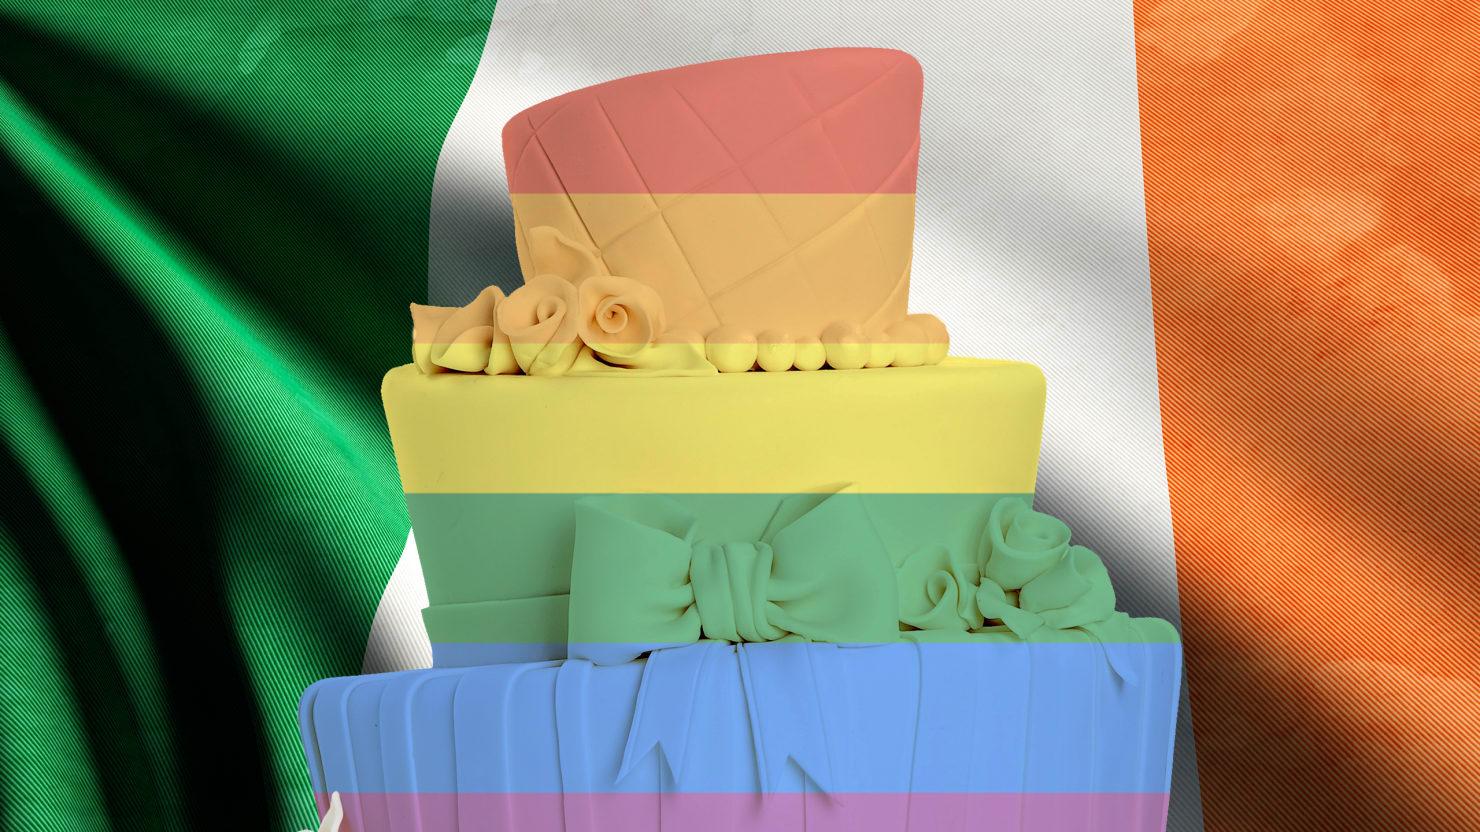 Let Them Eat Homophobic Cake